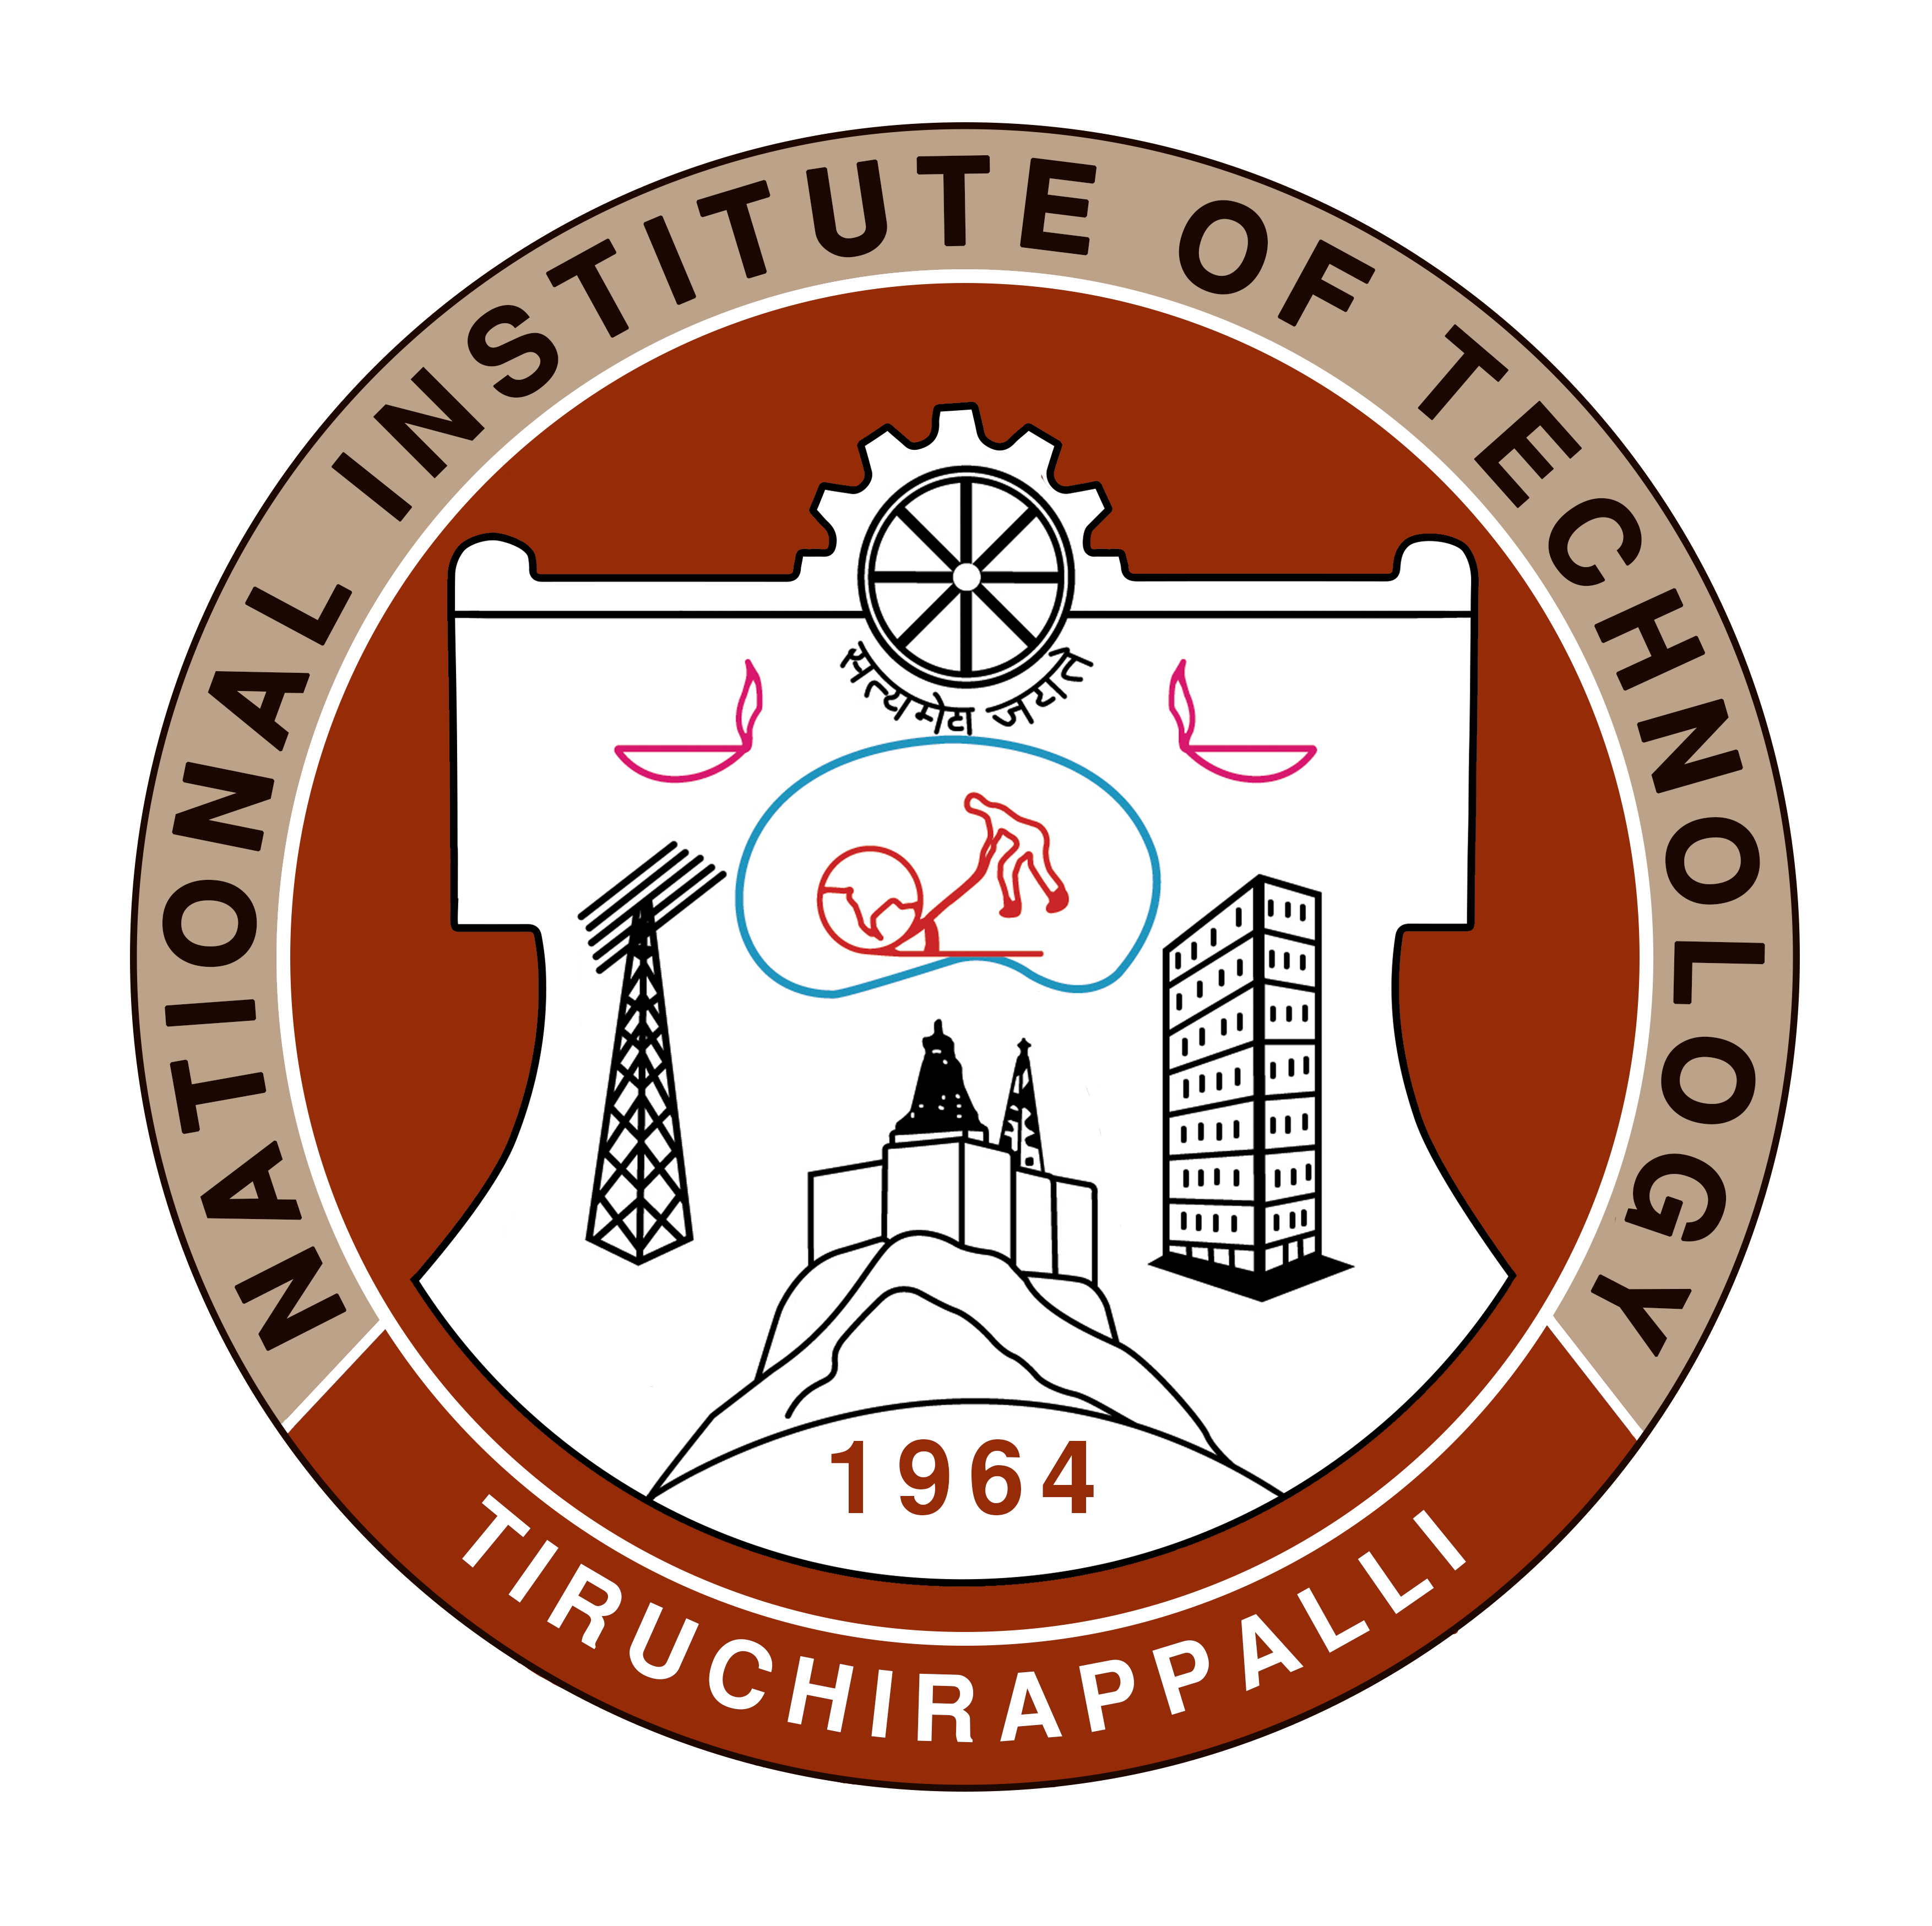 IMEC2019 - National Institute of Technology